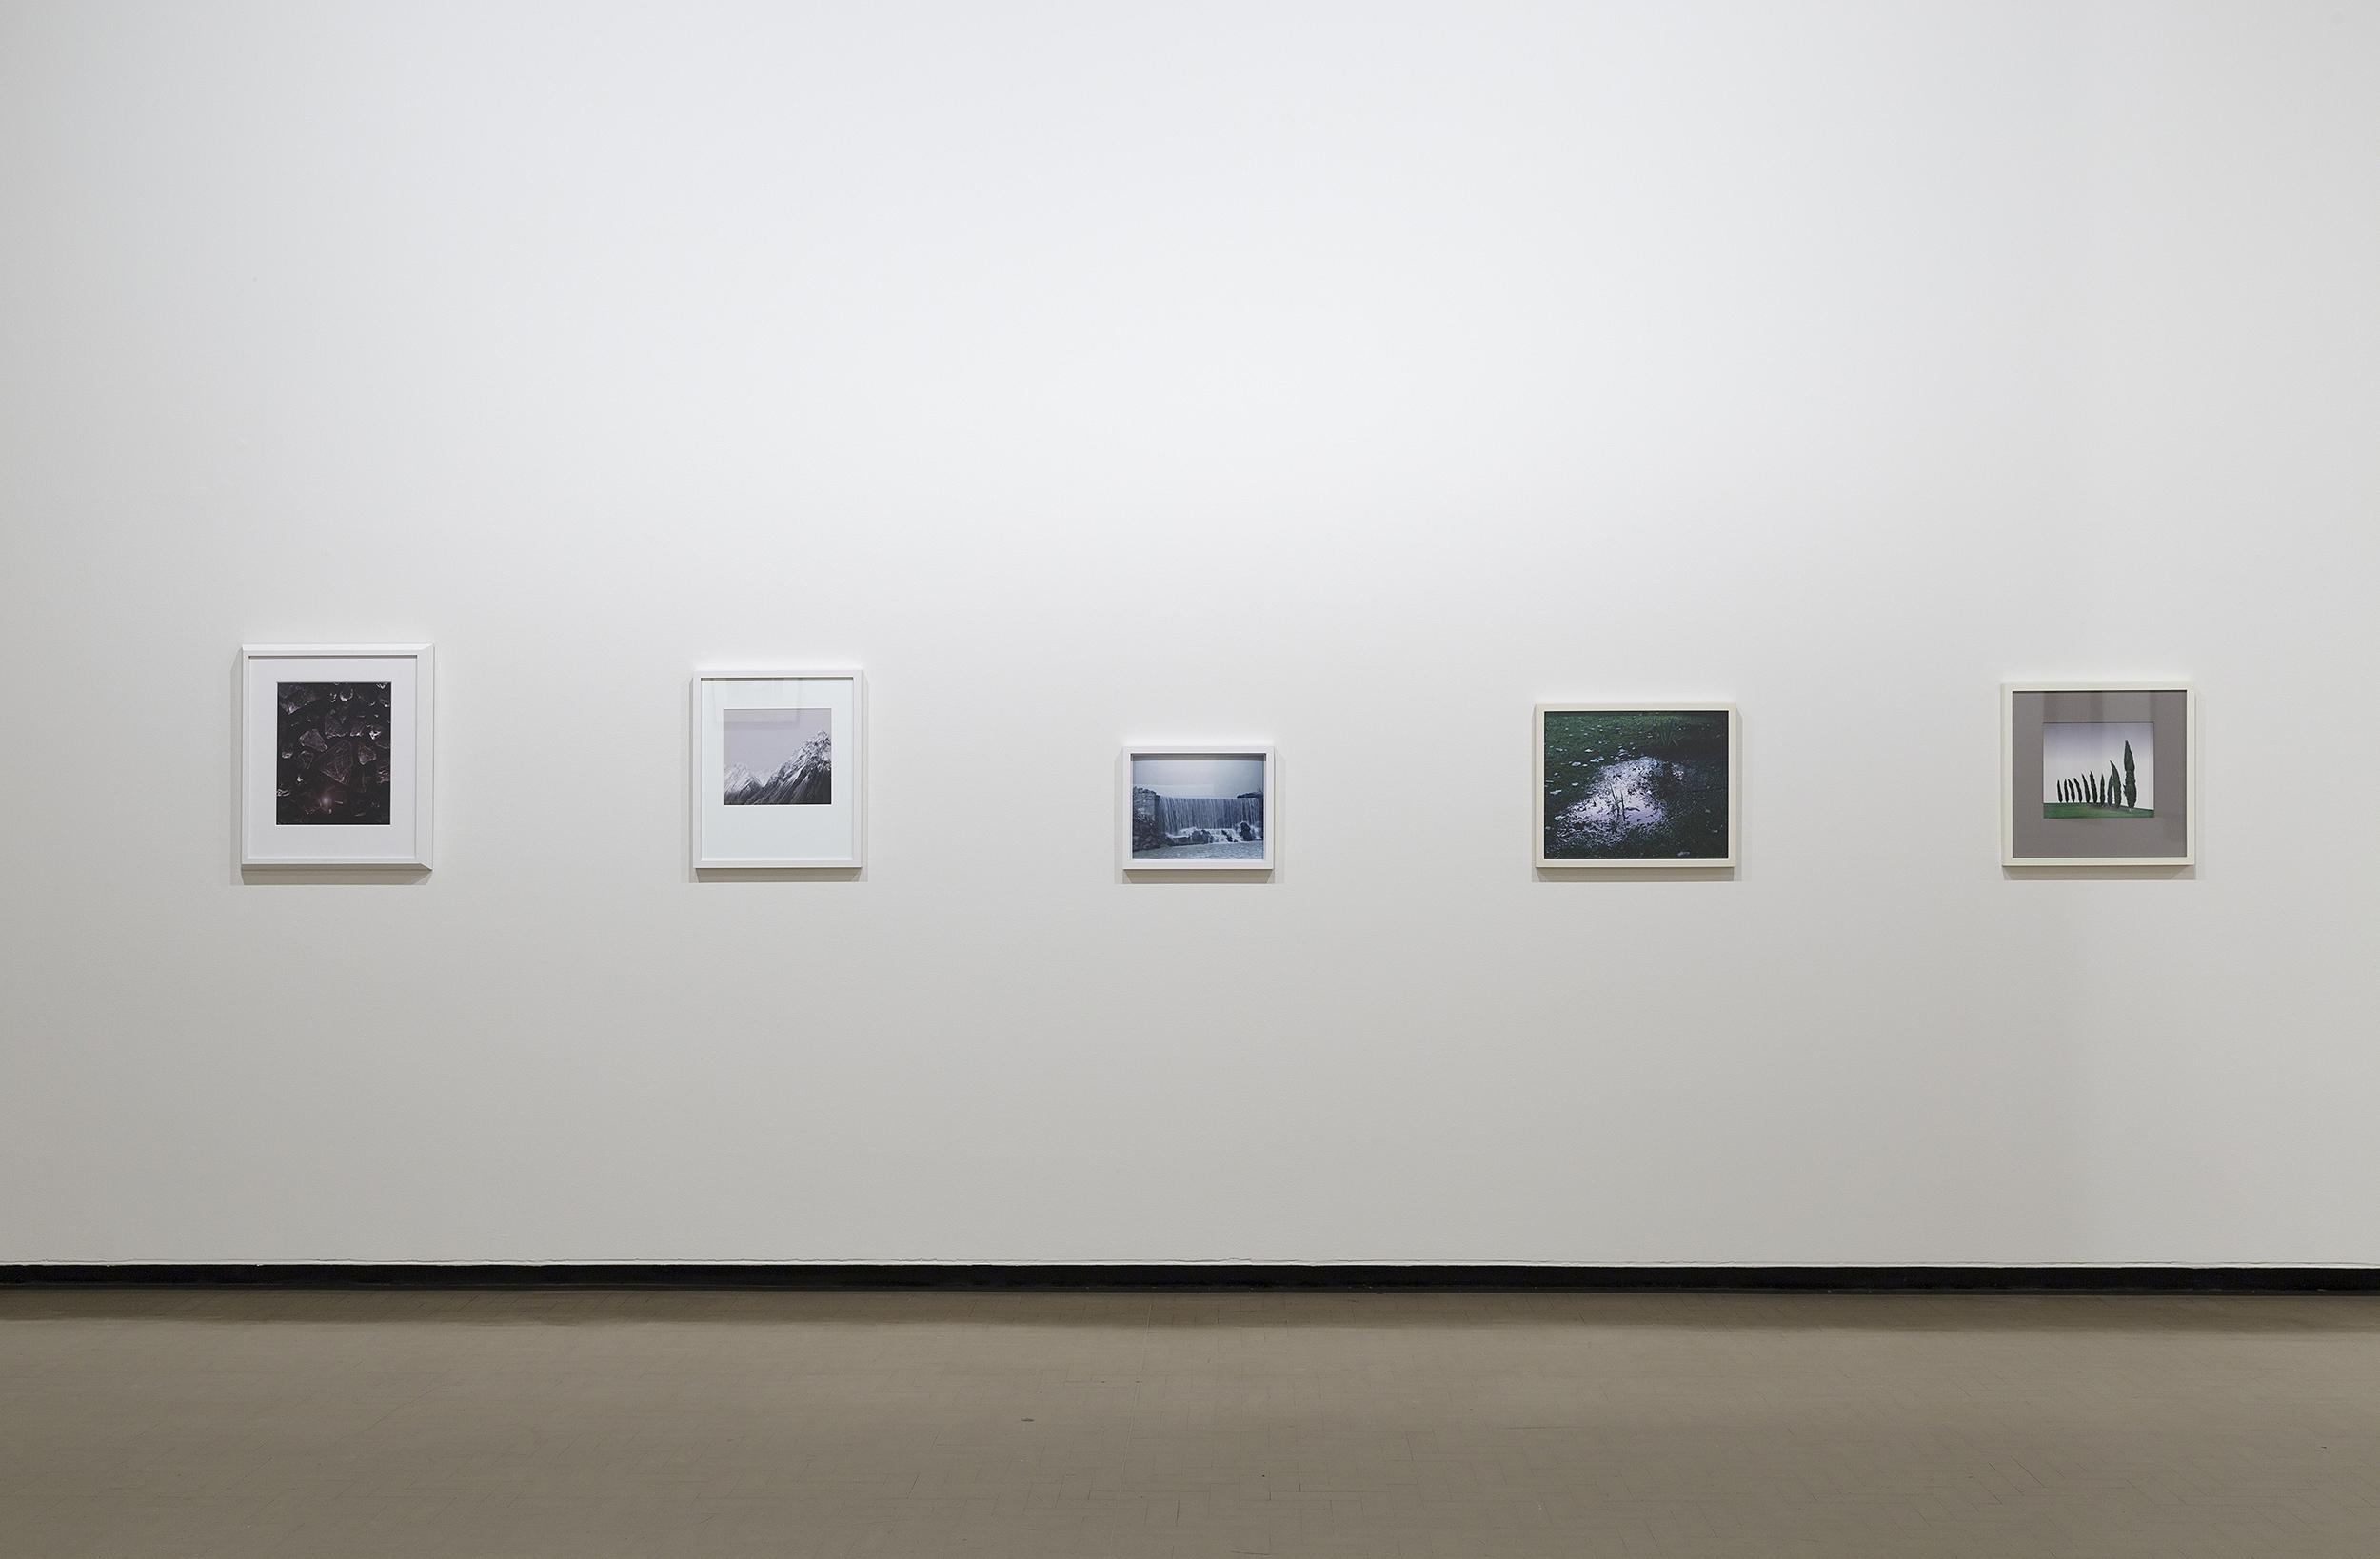 City Gallery_Yvonne Todd_Creamy Psychology_documentation_hiRez_002.jpg